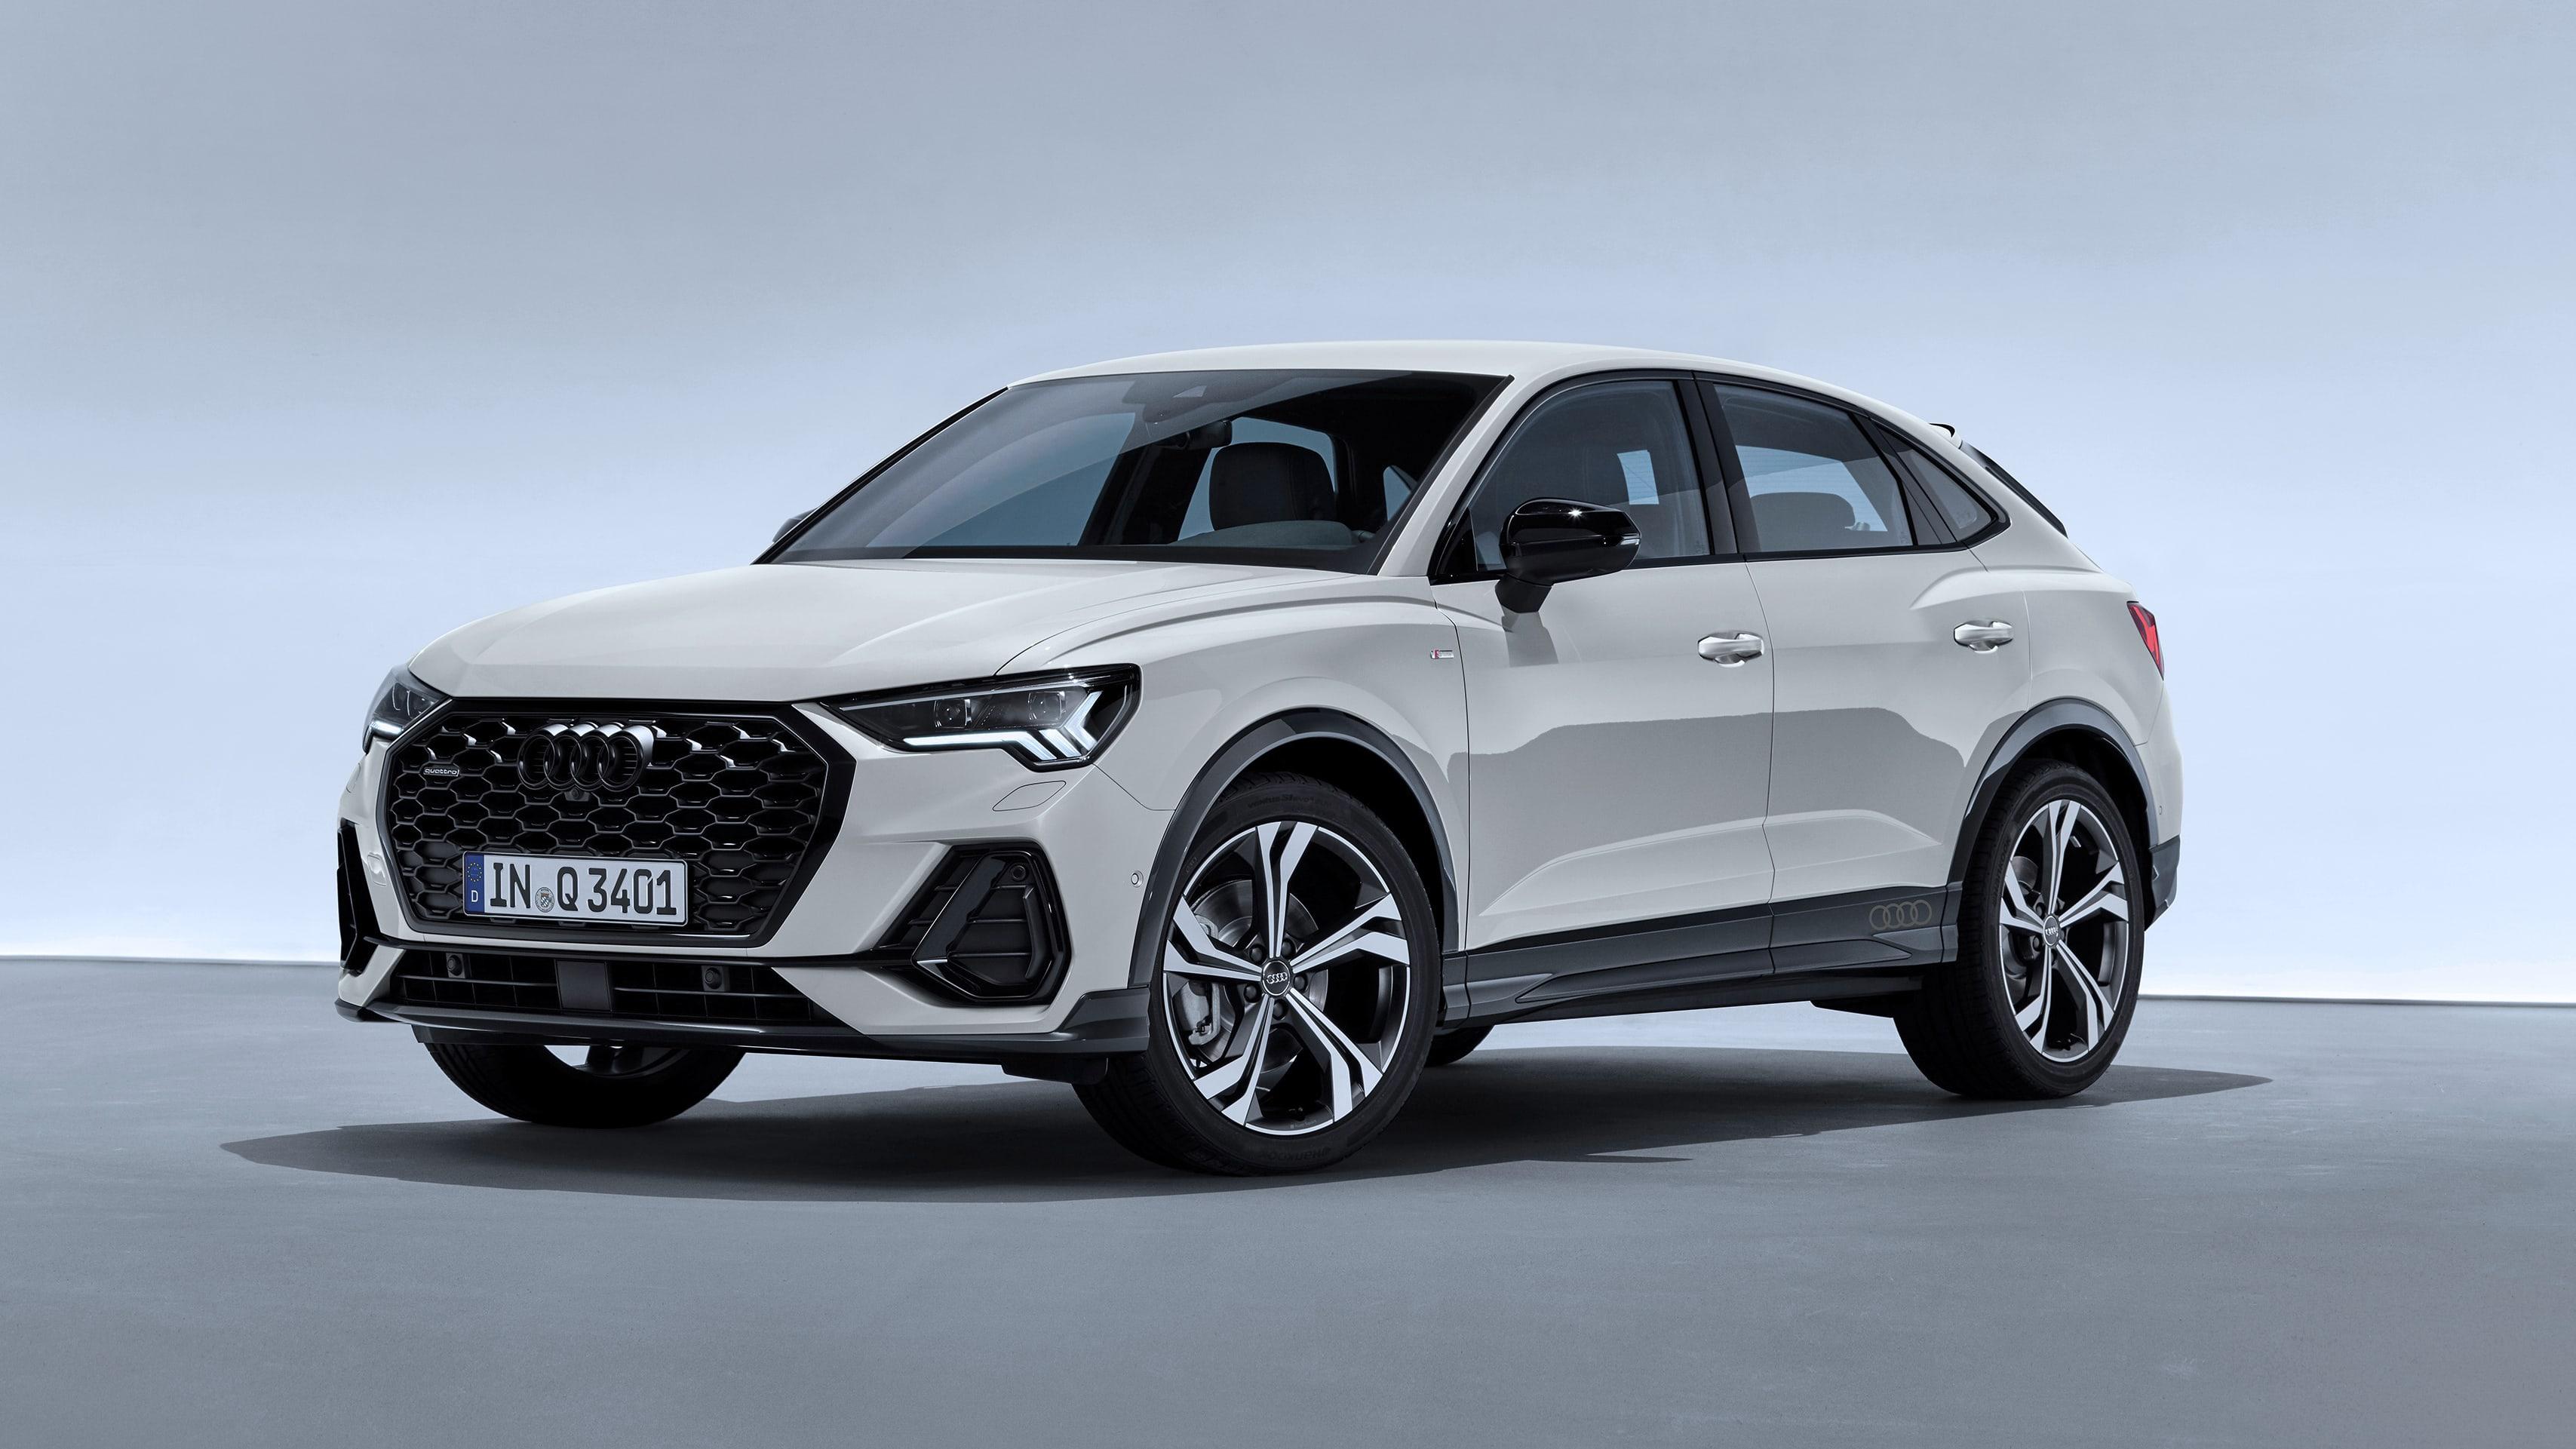 2020 Audi Q3 Sportback Coupe Styled Crossover Revealed Automotive News Newslocker